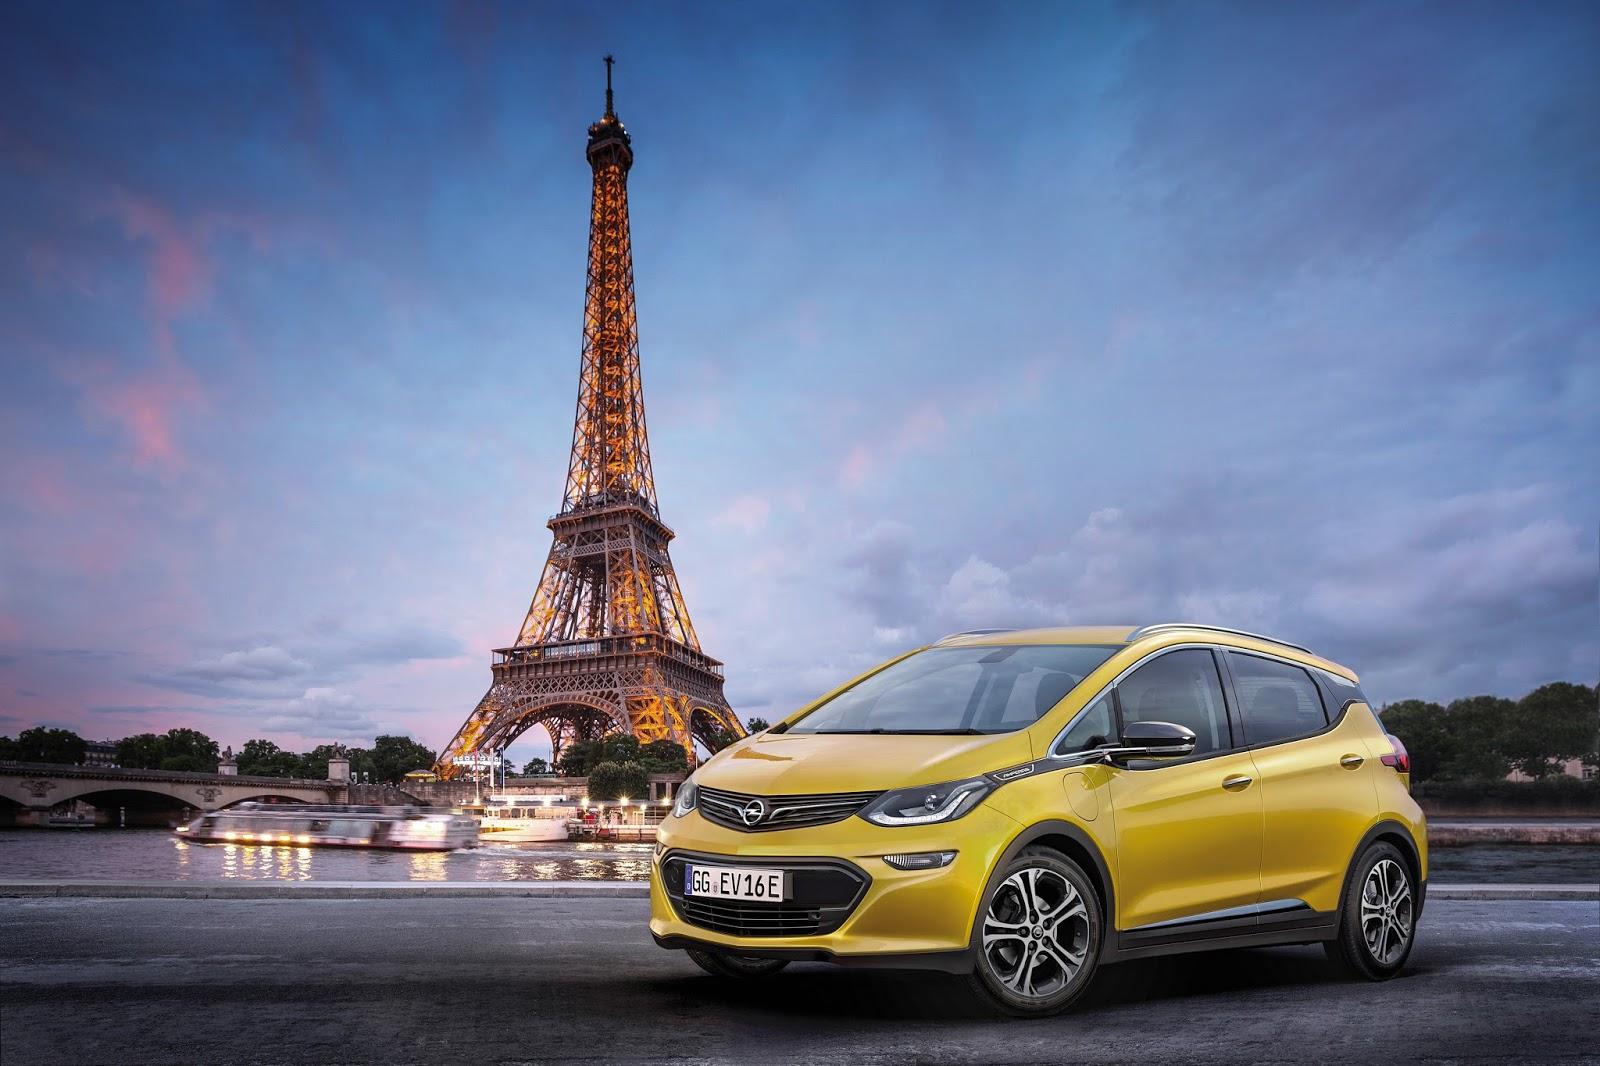 Opel Ampera e Paris 302756 To Opel Ampera-e σε ηλεκτρίζει με την φοβερή επιτάχυνση του